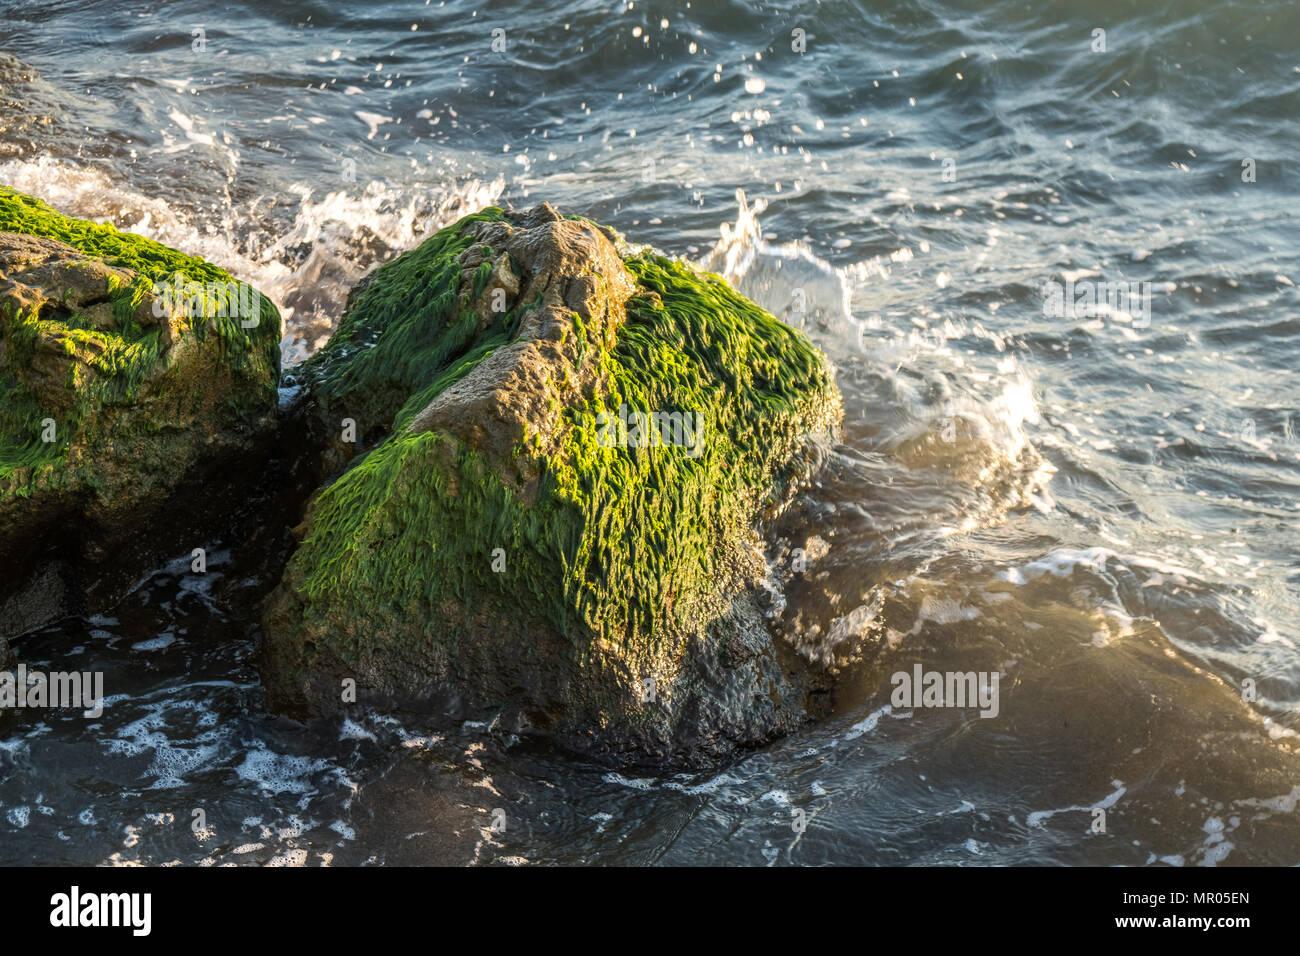 Green moss stuck on stone around sea waves. Sea waves hit the shore. Stock Photo